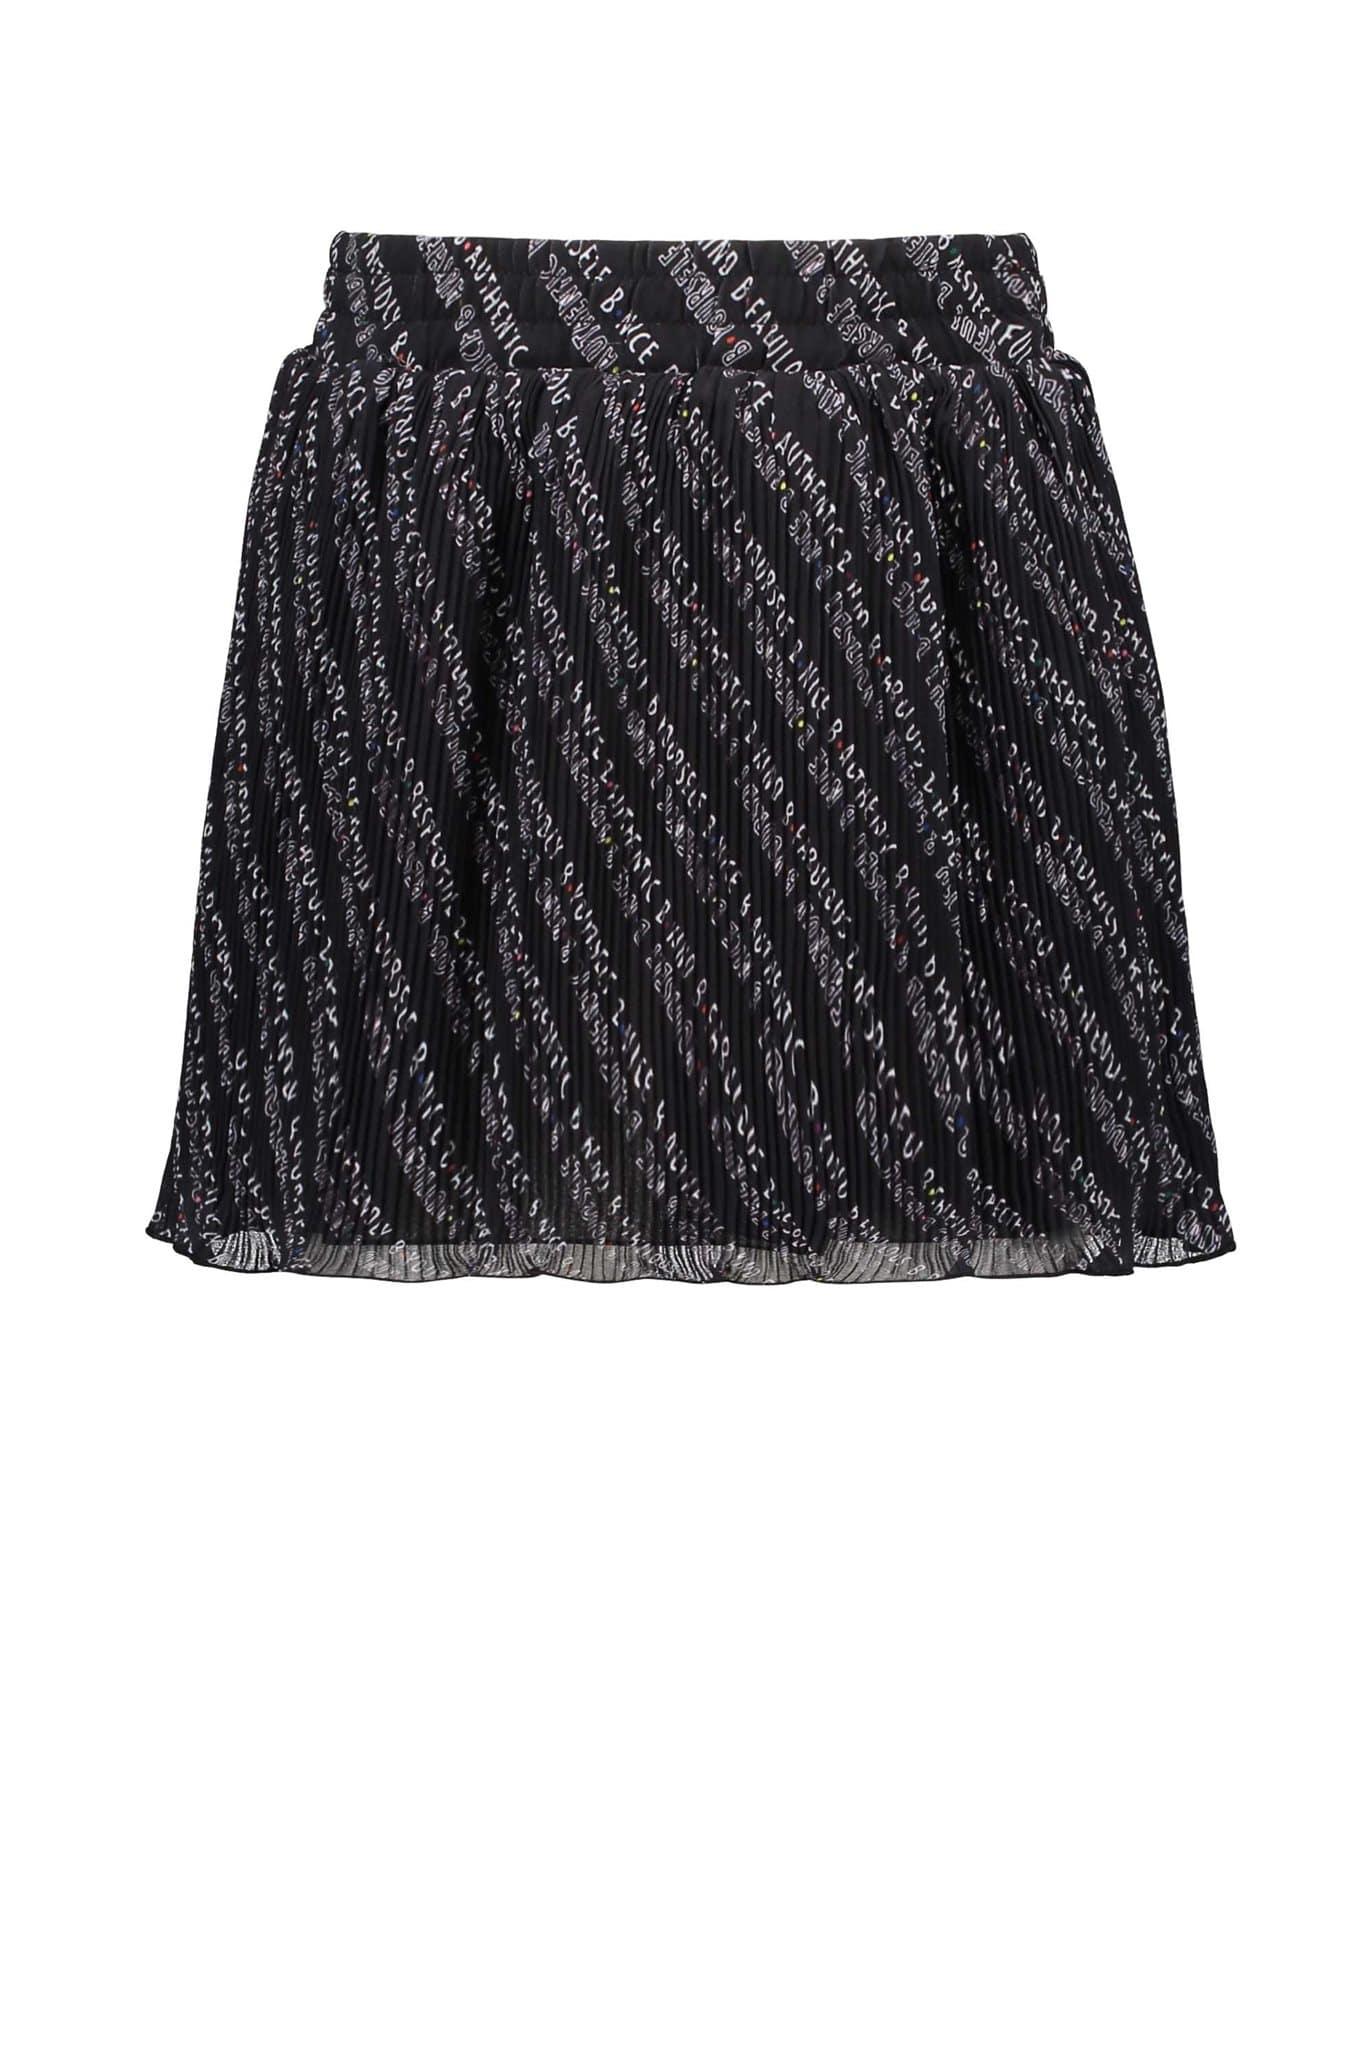 B Nosy B.Yourself Plissé Skirt